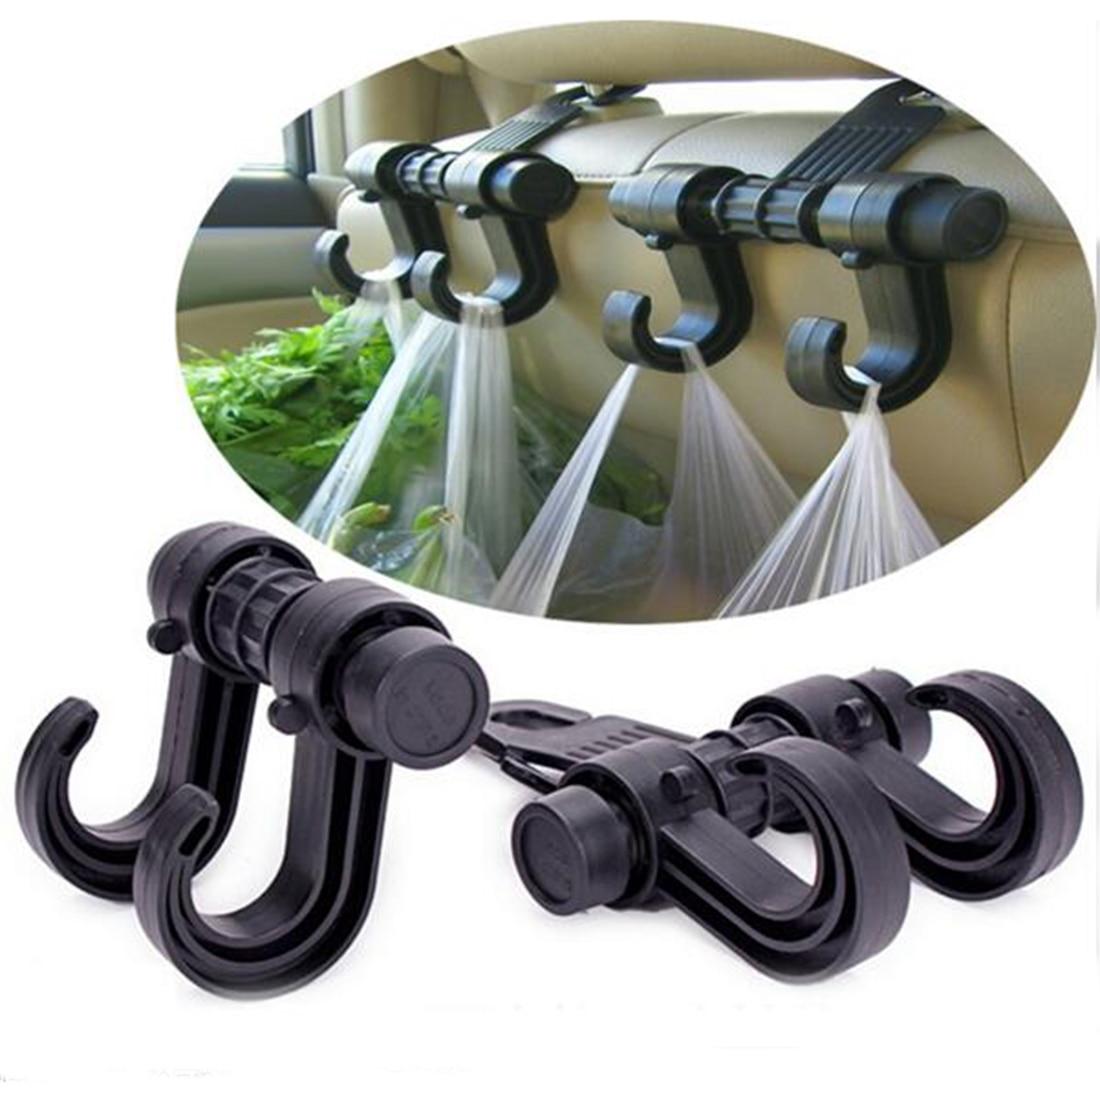 new double auto car back seat headrest hanger holder hooks clips for bag purse cloth grocery. Black Bedroom Furniture Sets. Home Design Ideas